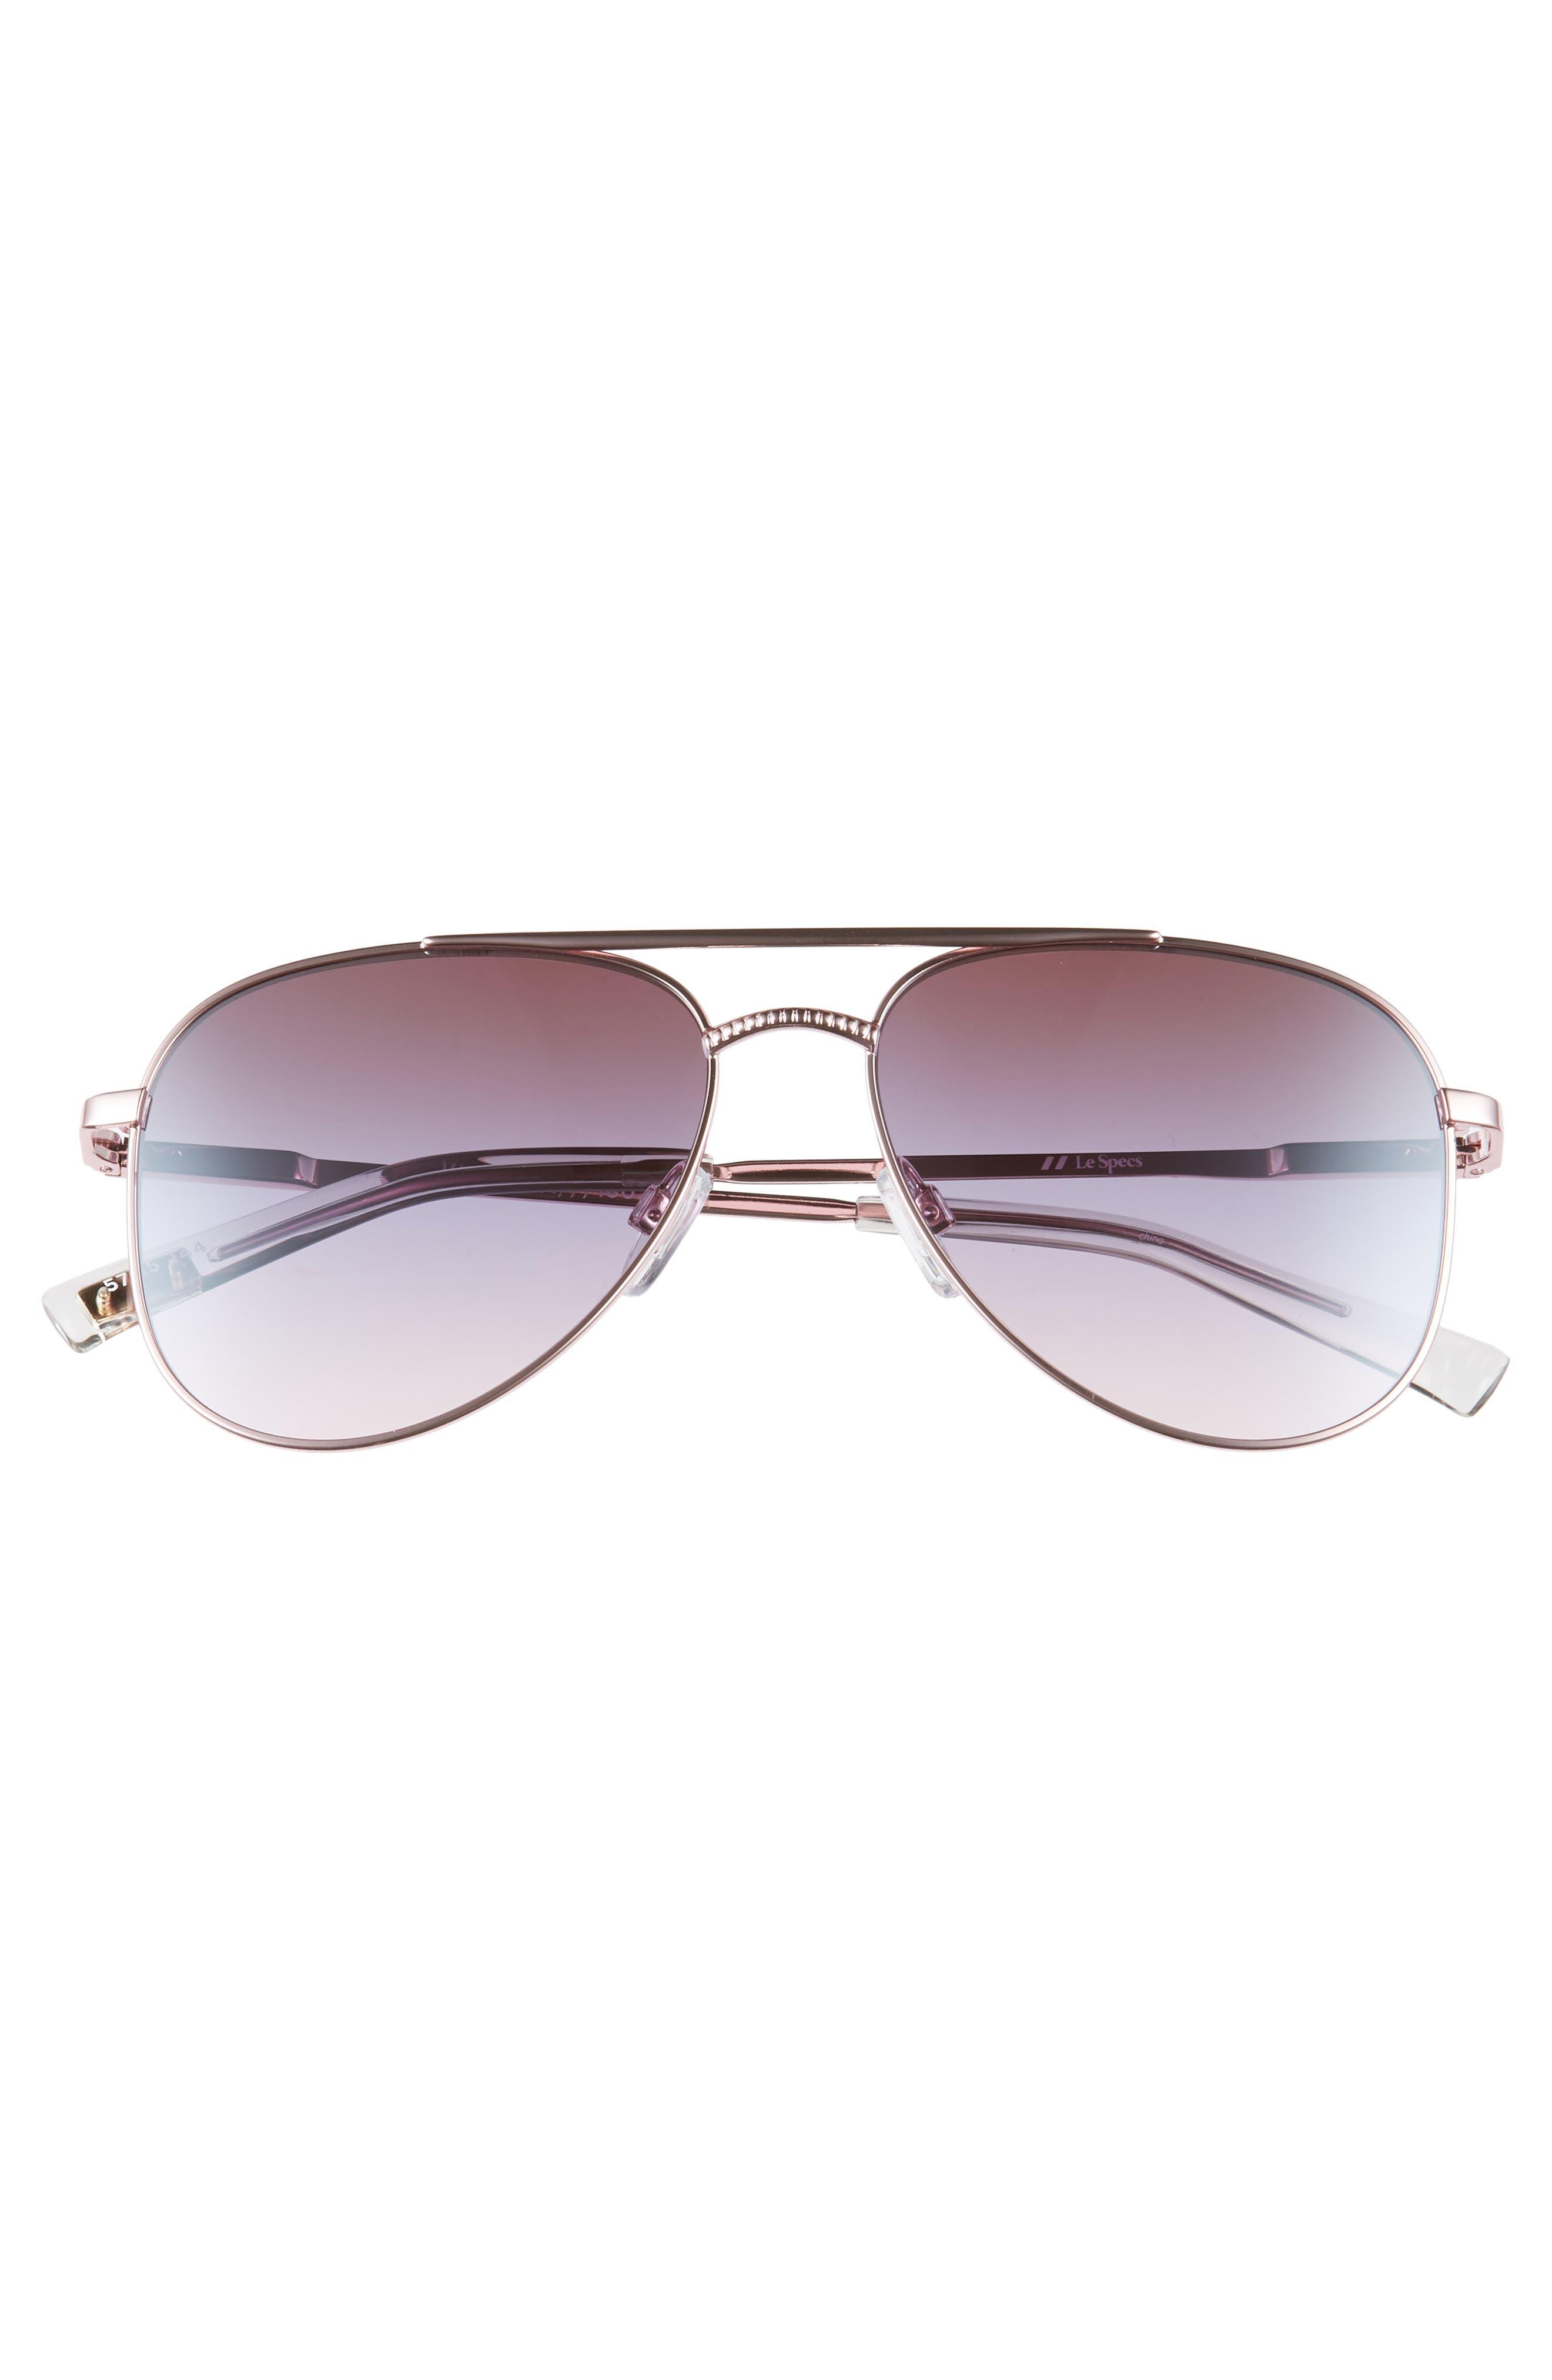 Kingdom 57mm Aviator Sunglasses,                             Alternate thumbnail 3, color,                             ROSE GOLD